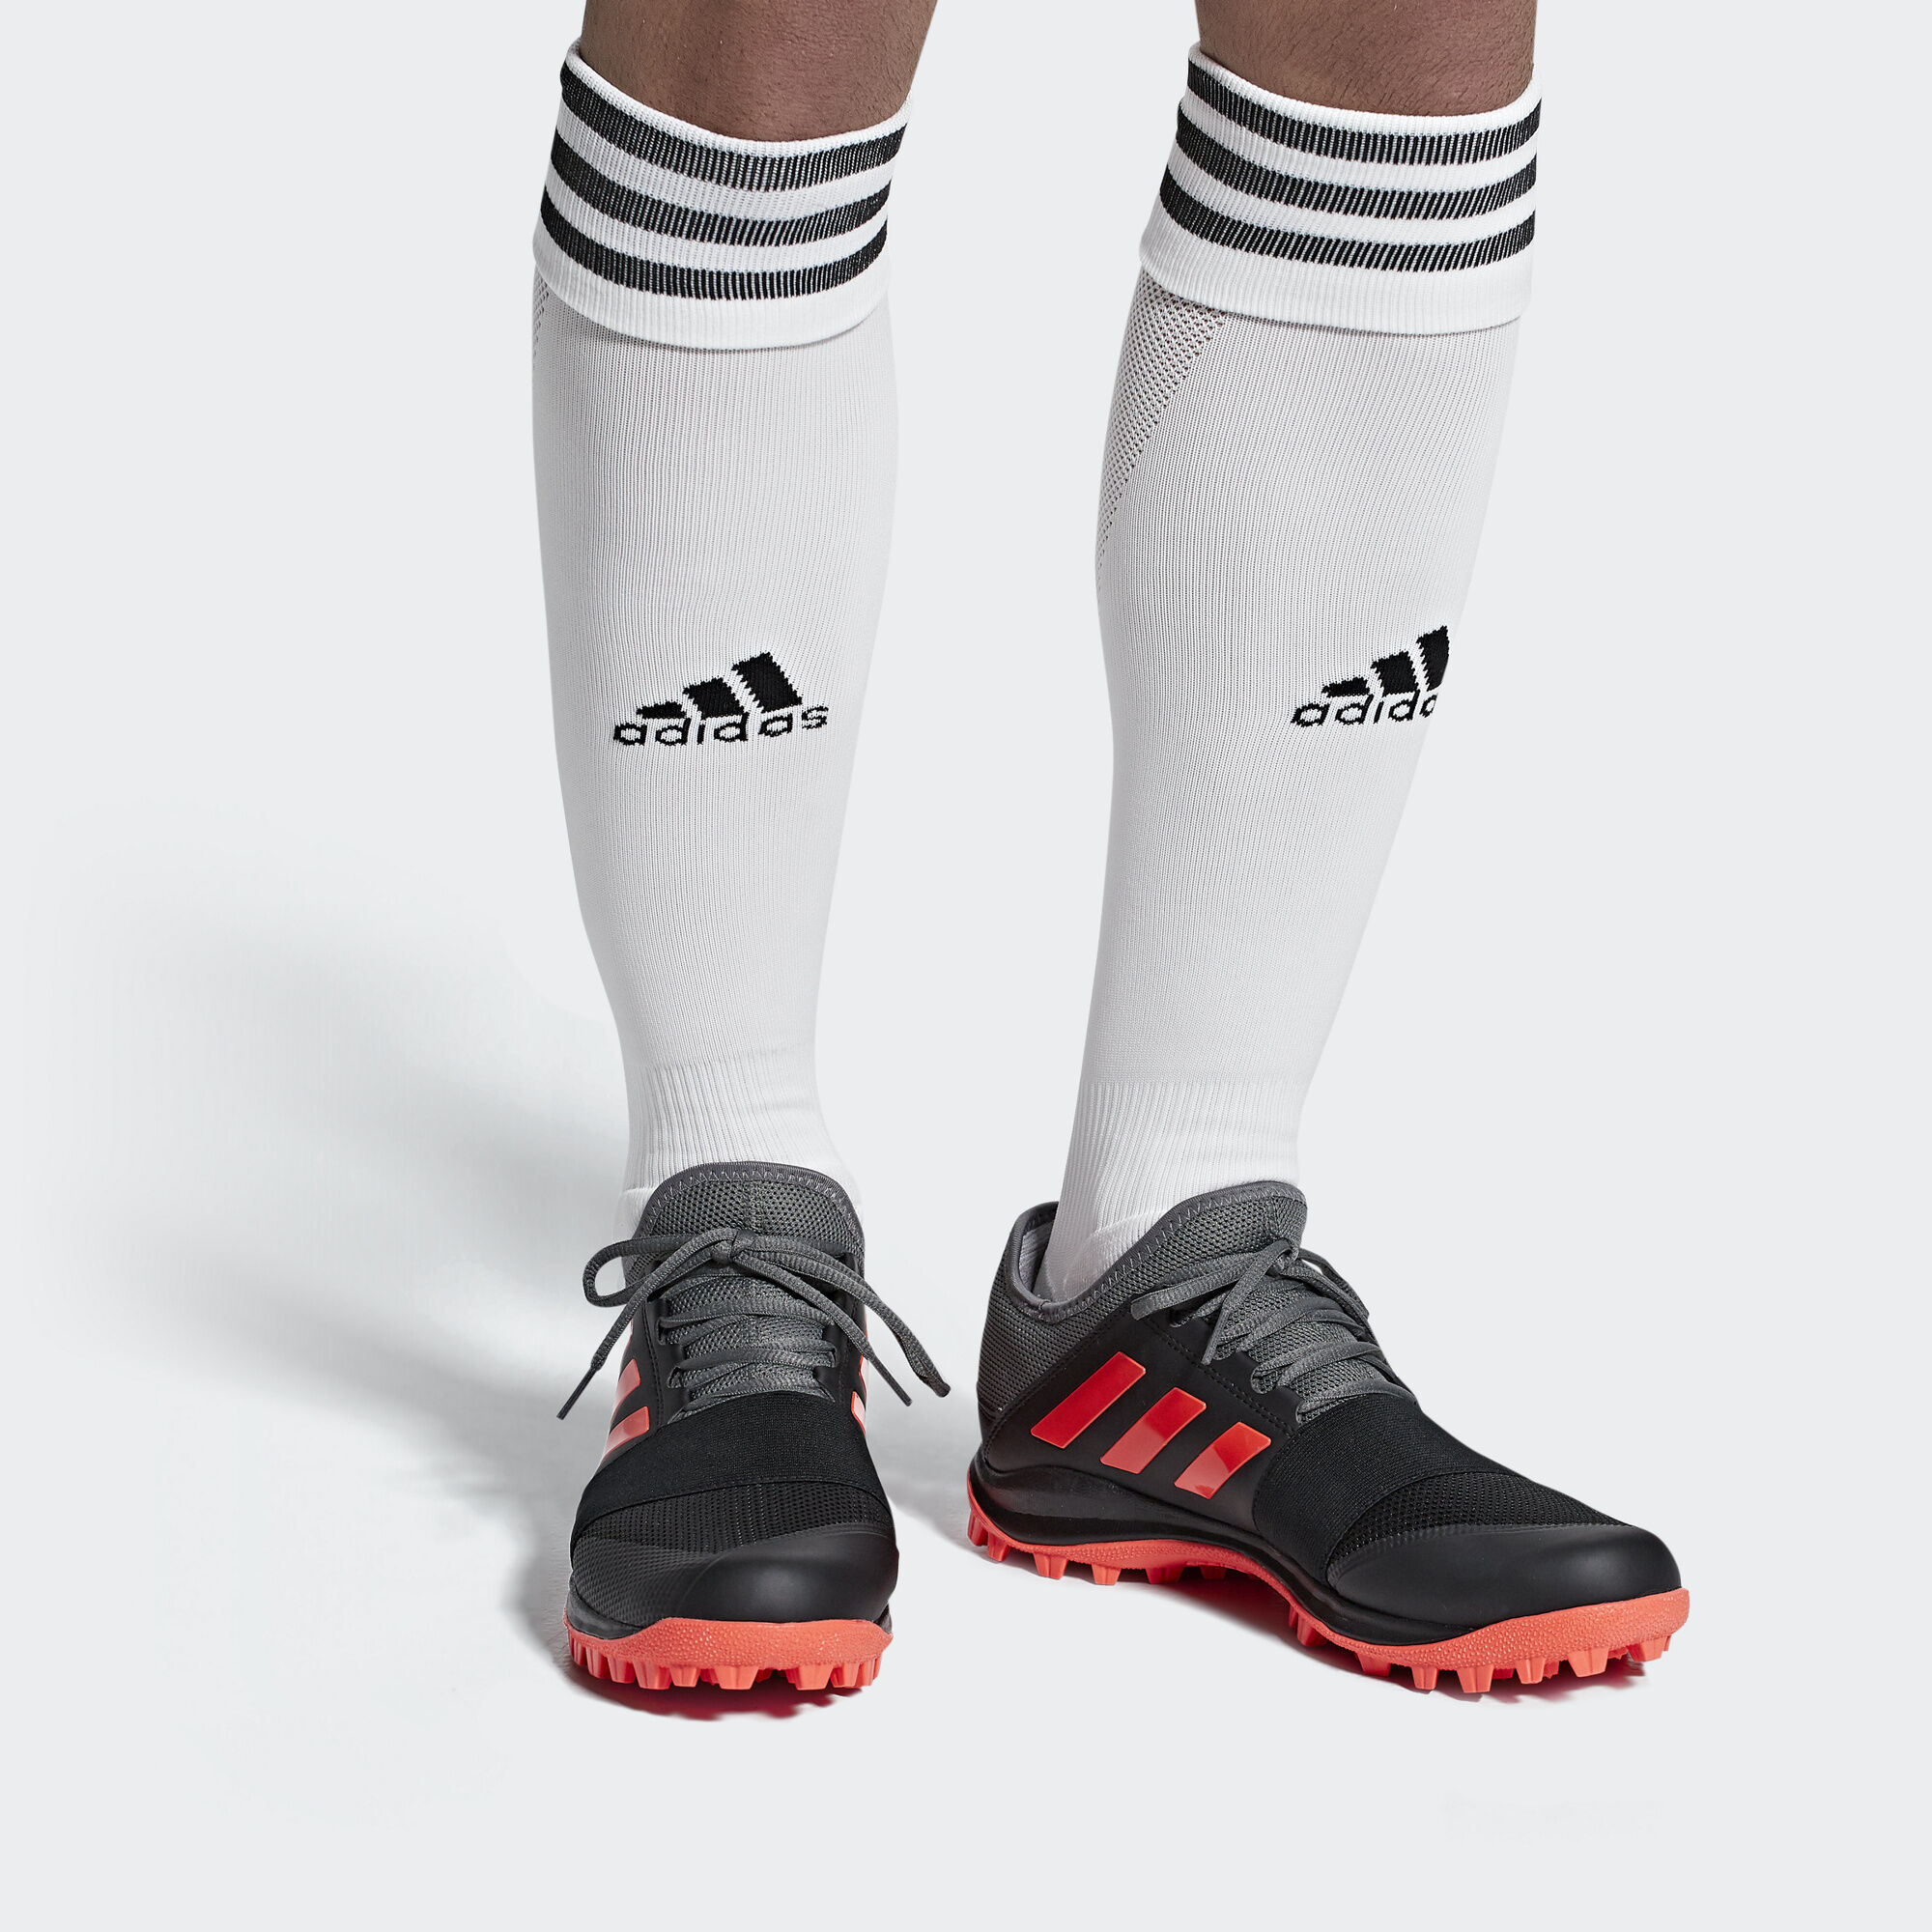 sports shoes eba9d 83f81 ... more photos 2d525 cd530 adidas Divox 1.9S sko - Gul adidas Denmark